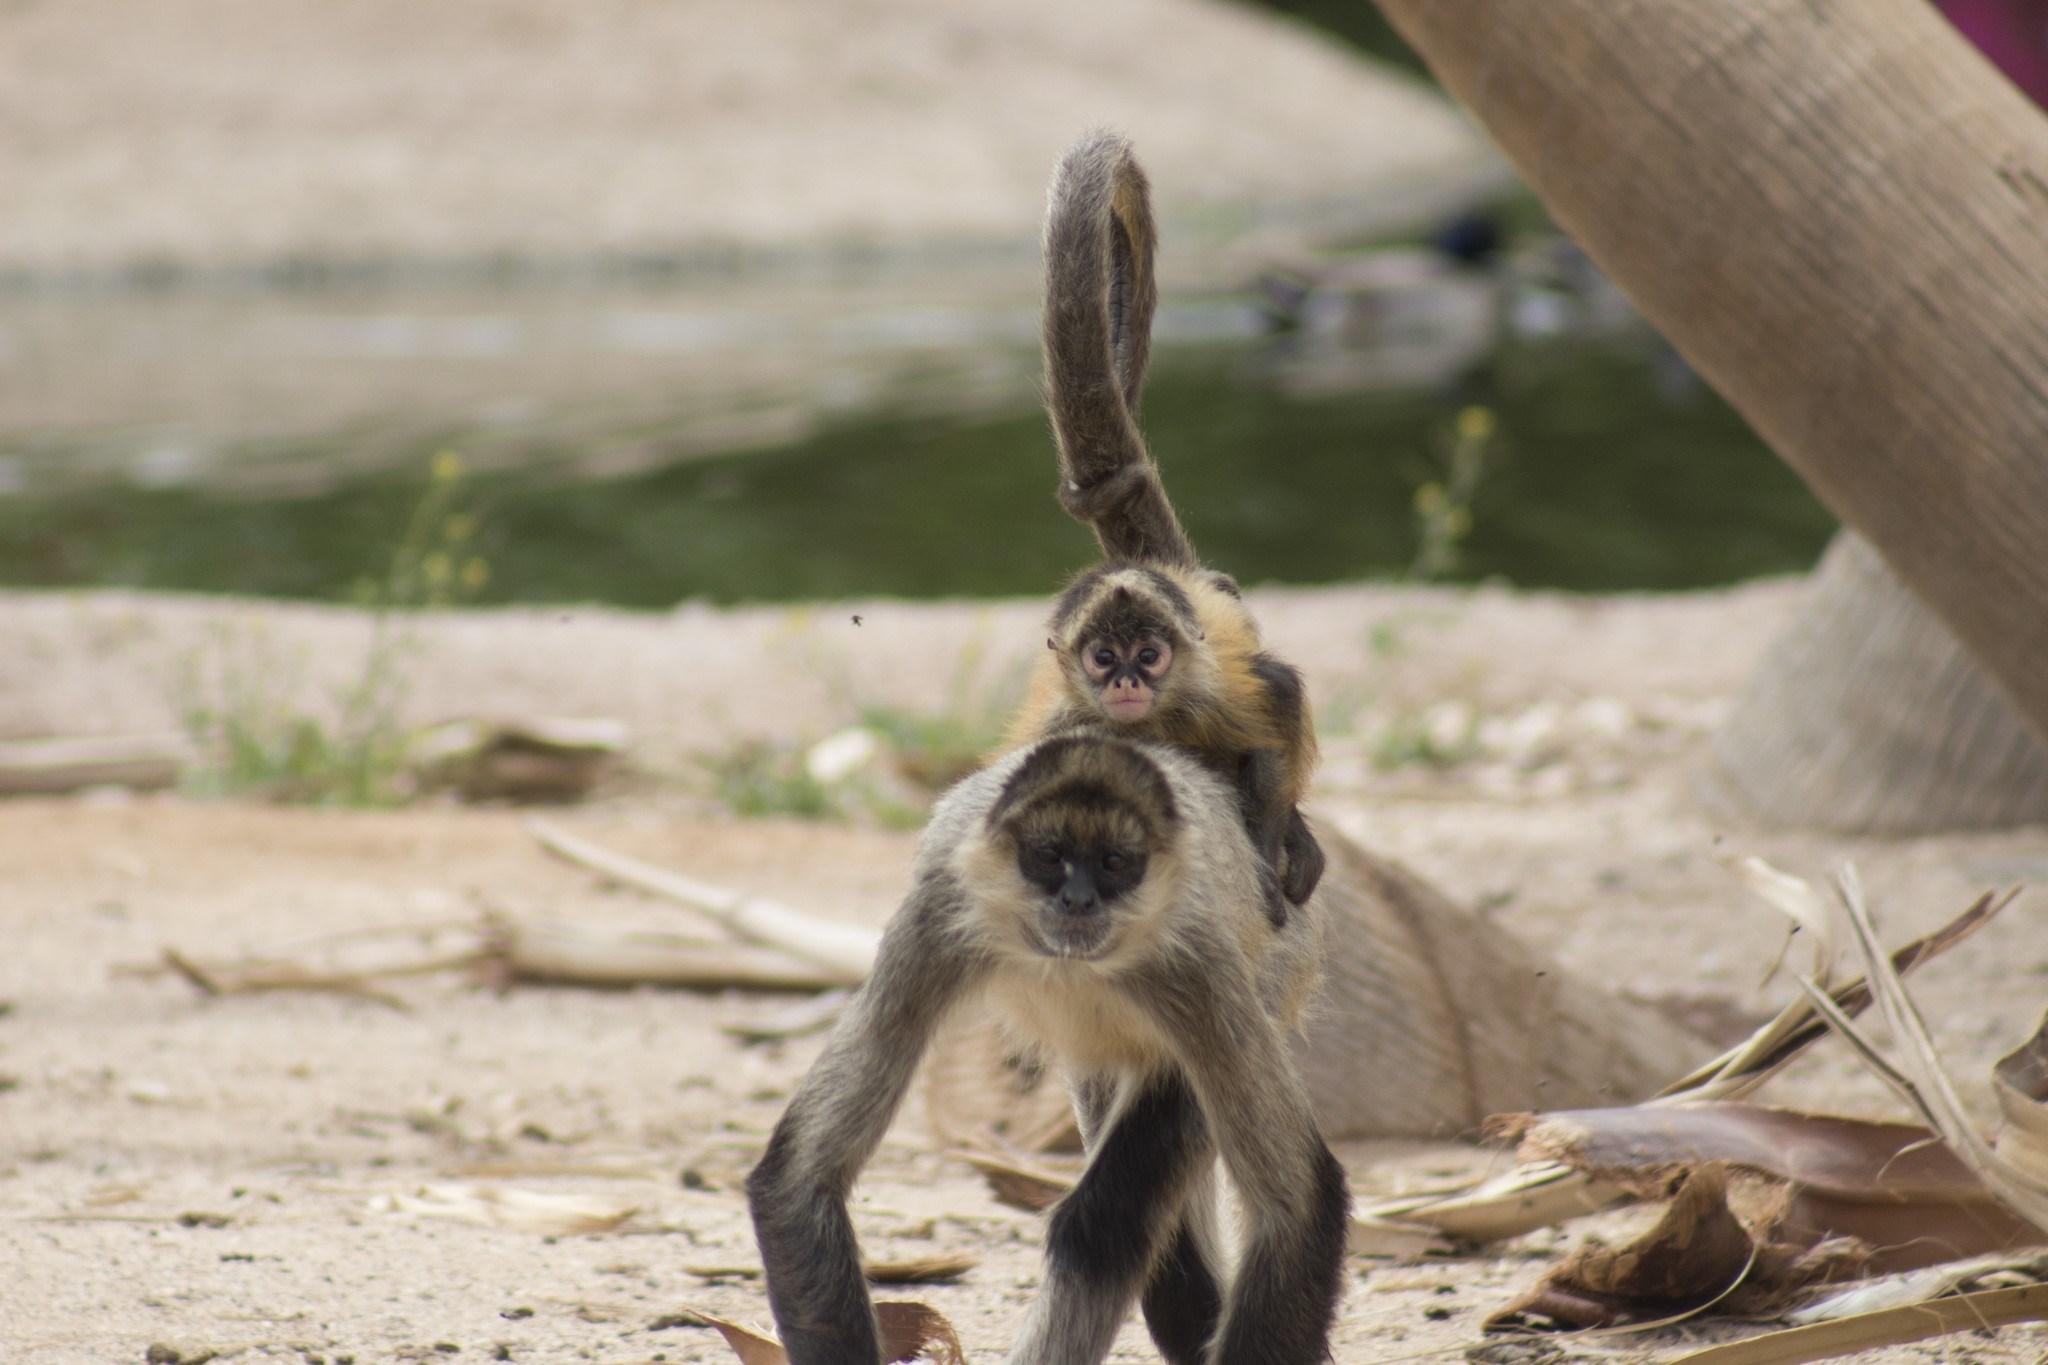 Baby Spider monkey born at Wildlife World Zoo. (Source: Wildlife World Zoo)